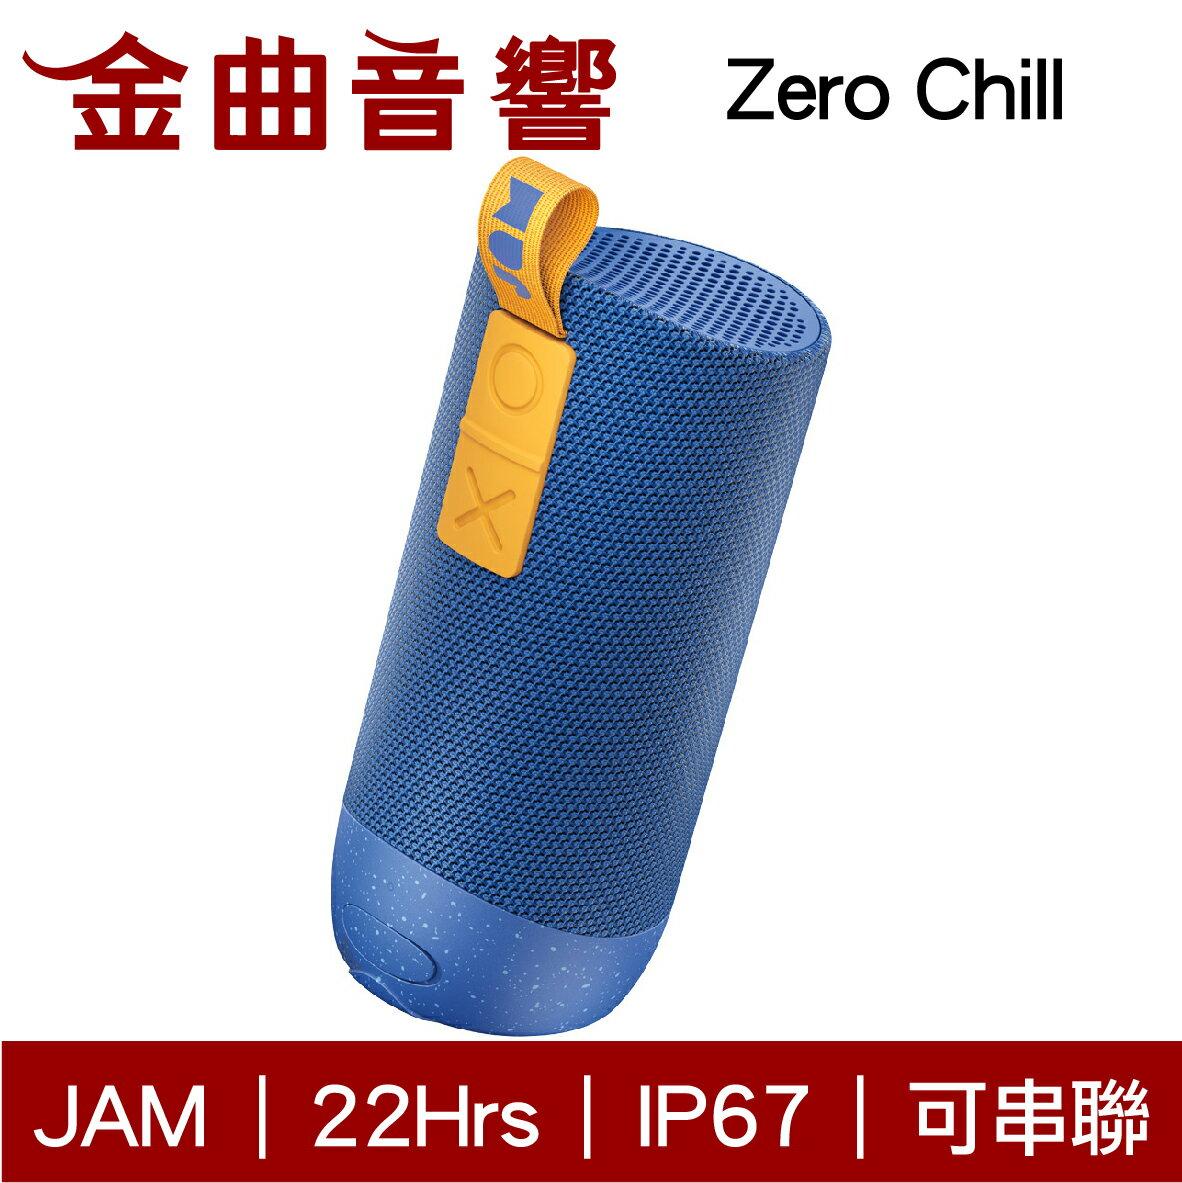 JAM Zero Chill 藍 藍牙喇叭 HX-P606 | 金曲音響